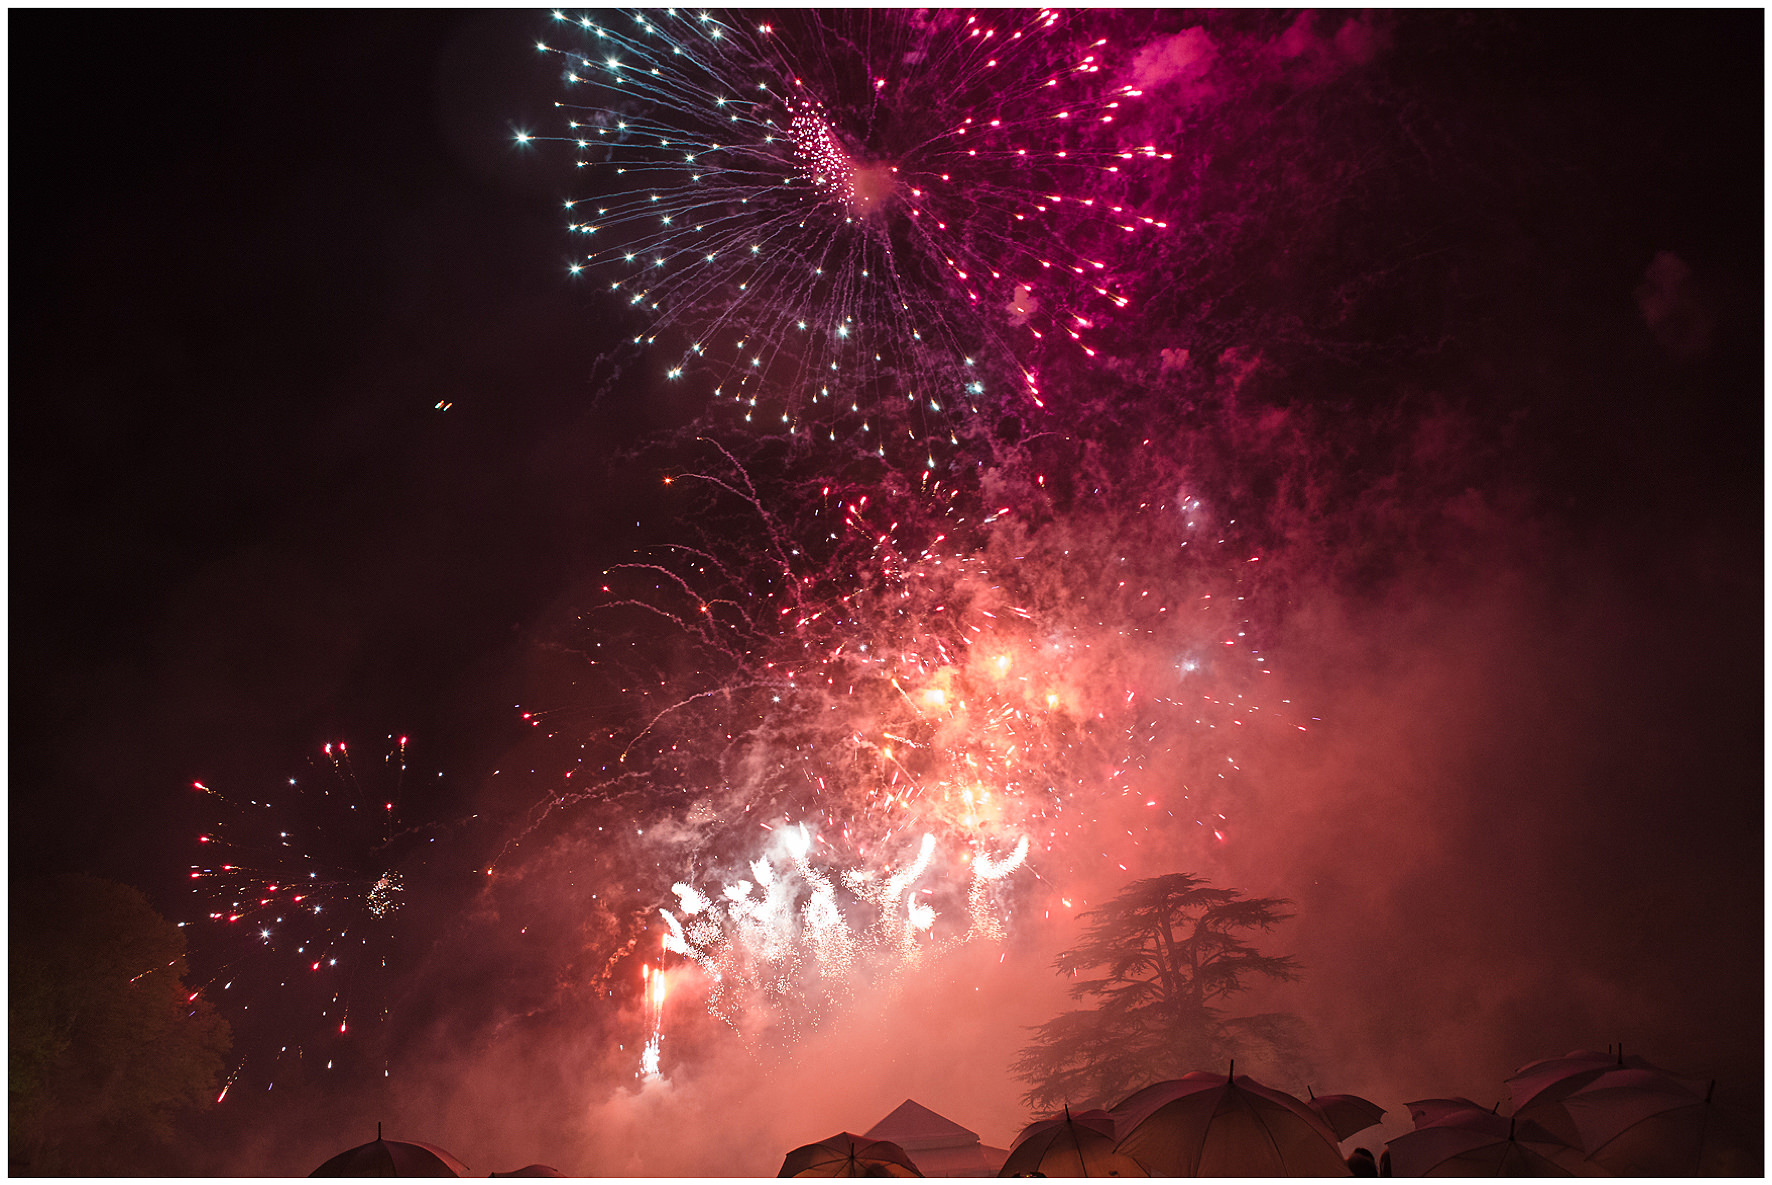 luxury wedding, berkshire, home wedding, fireworks, Lucy Davenport Photography